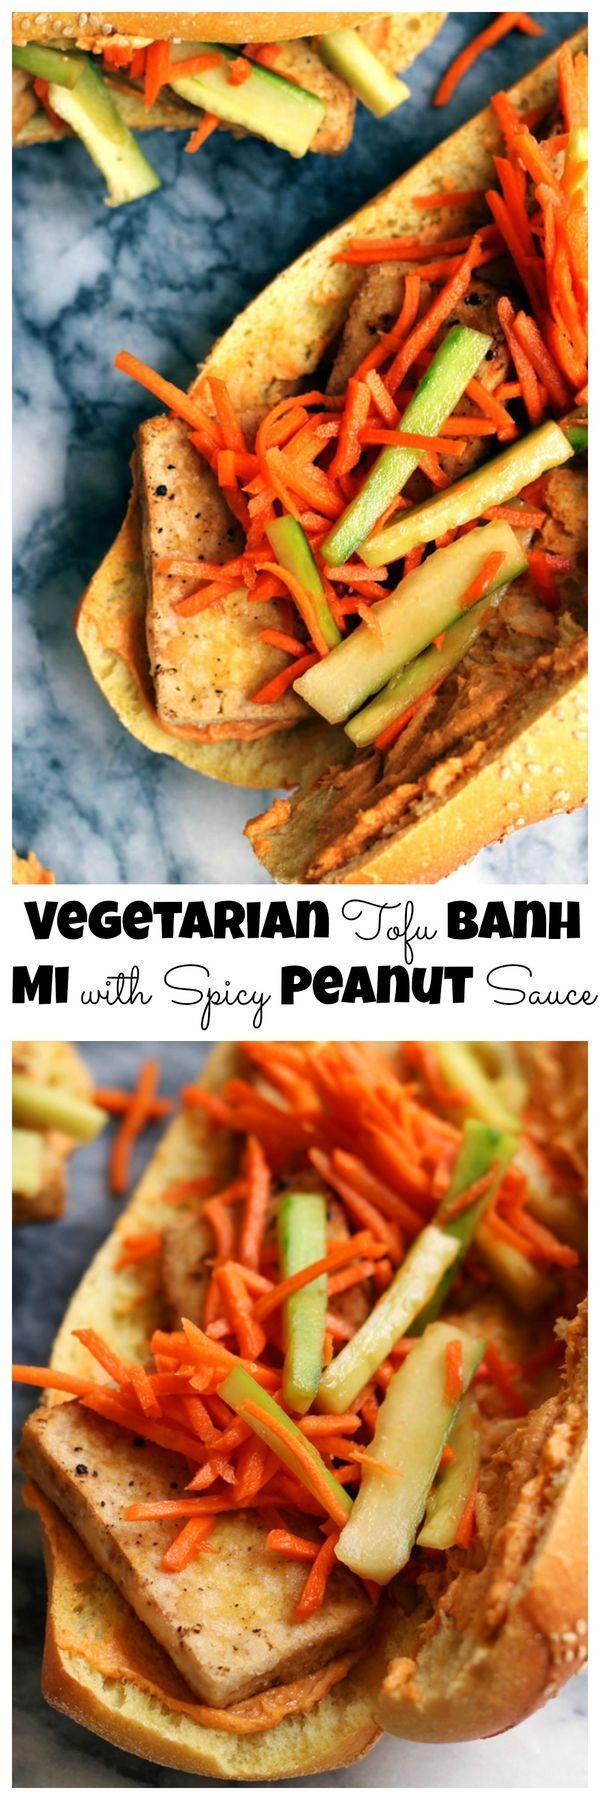 ... Foodgasmic: Vegetarian/Vegan on Pinterest | Tofu, Chickpeas and Vegans